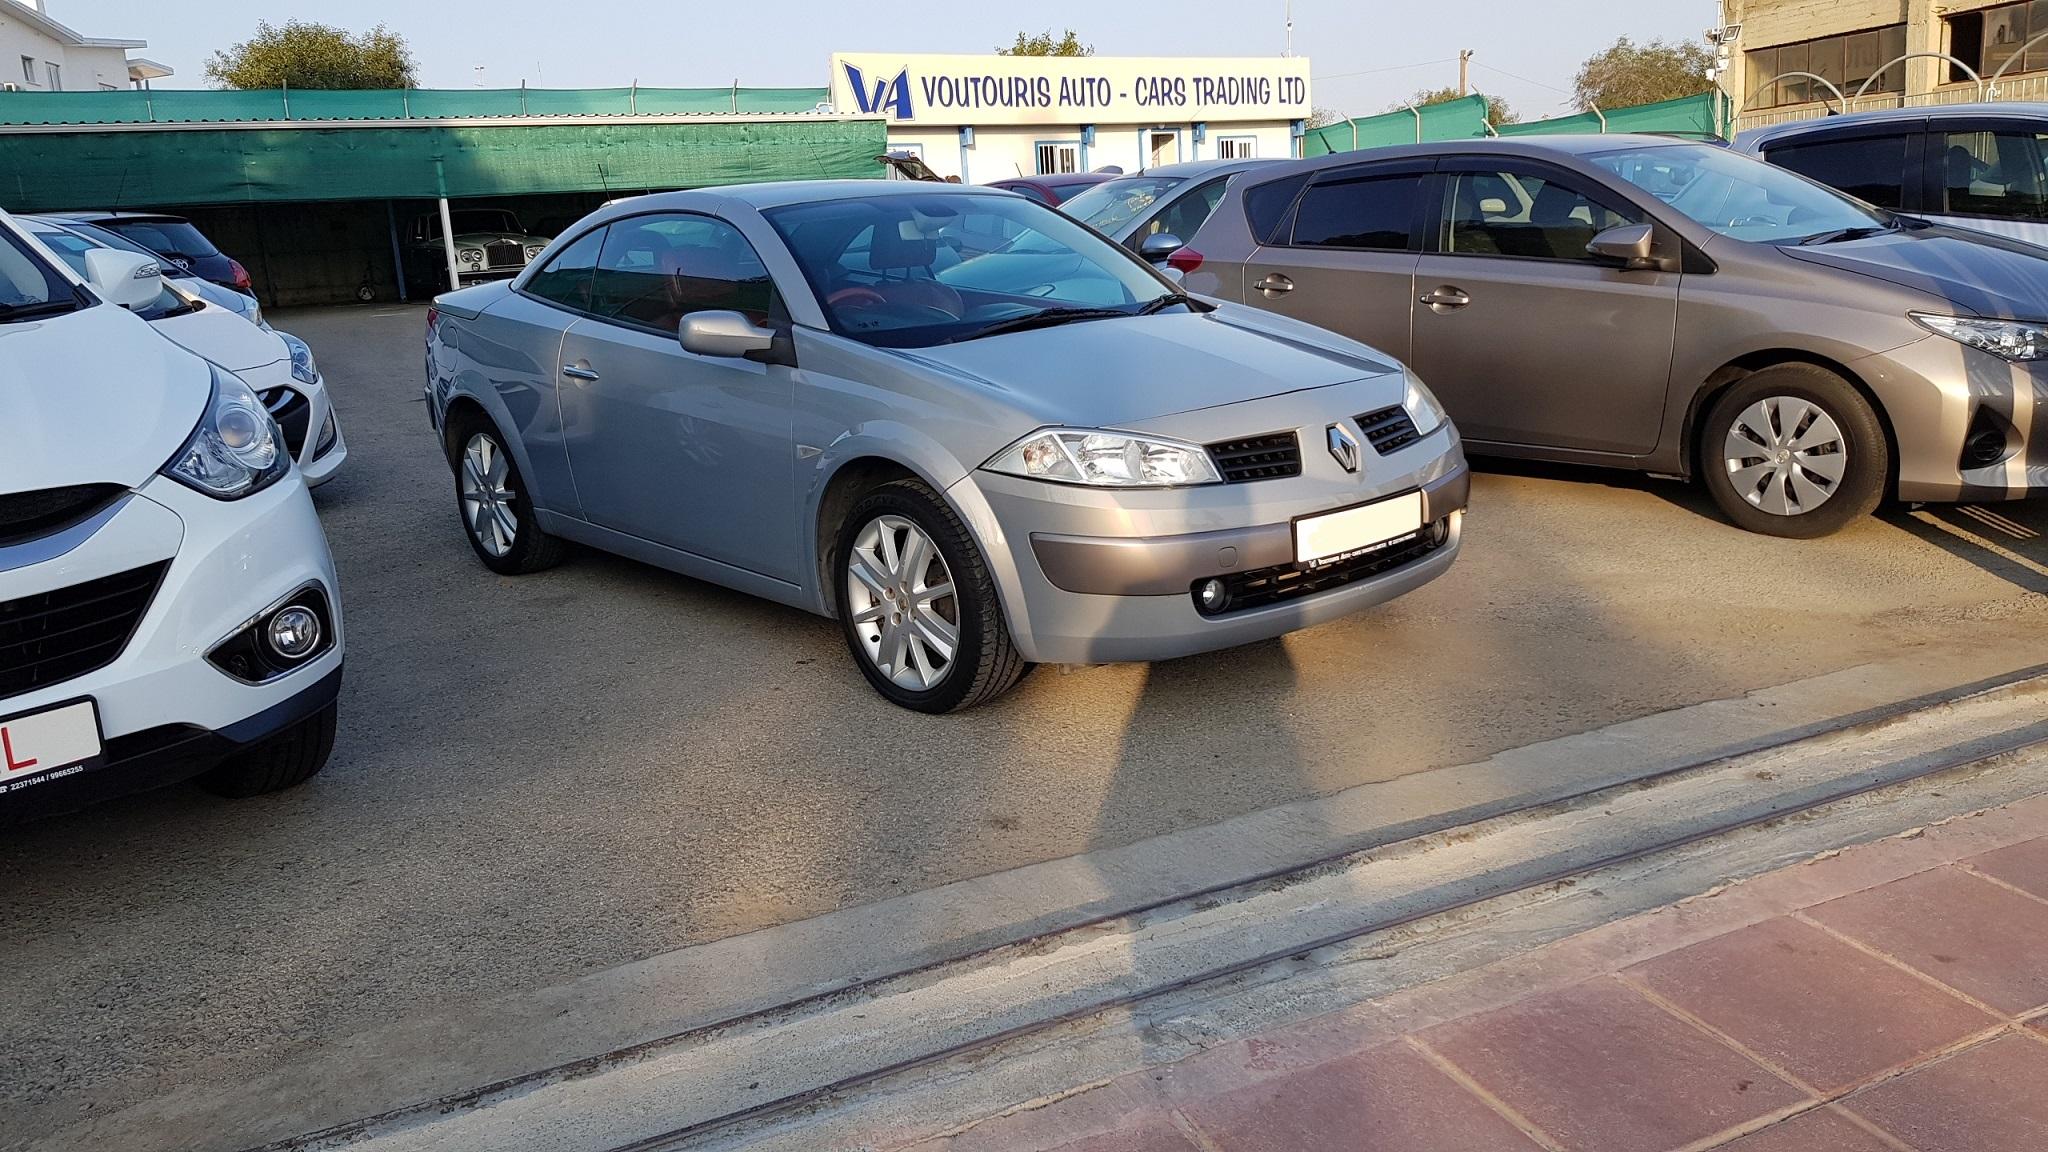 Renault Megane Convertible 02